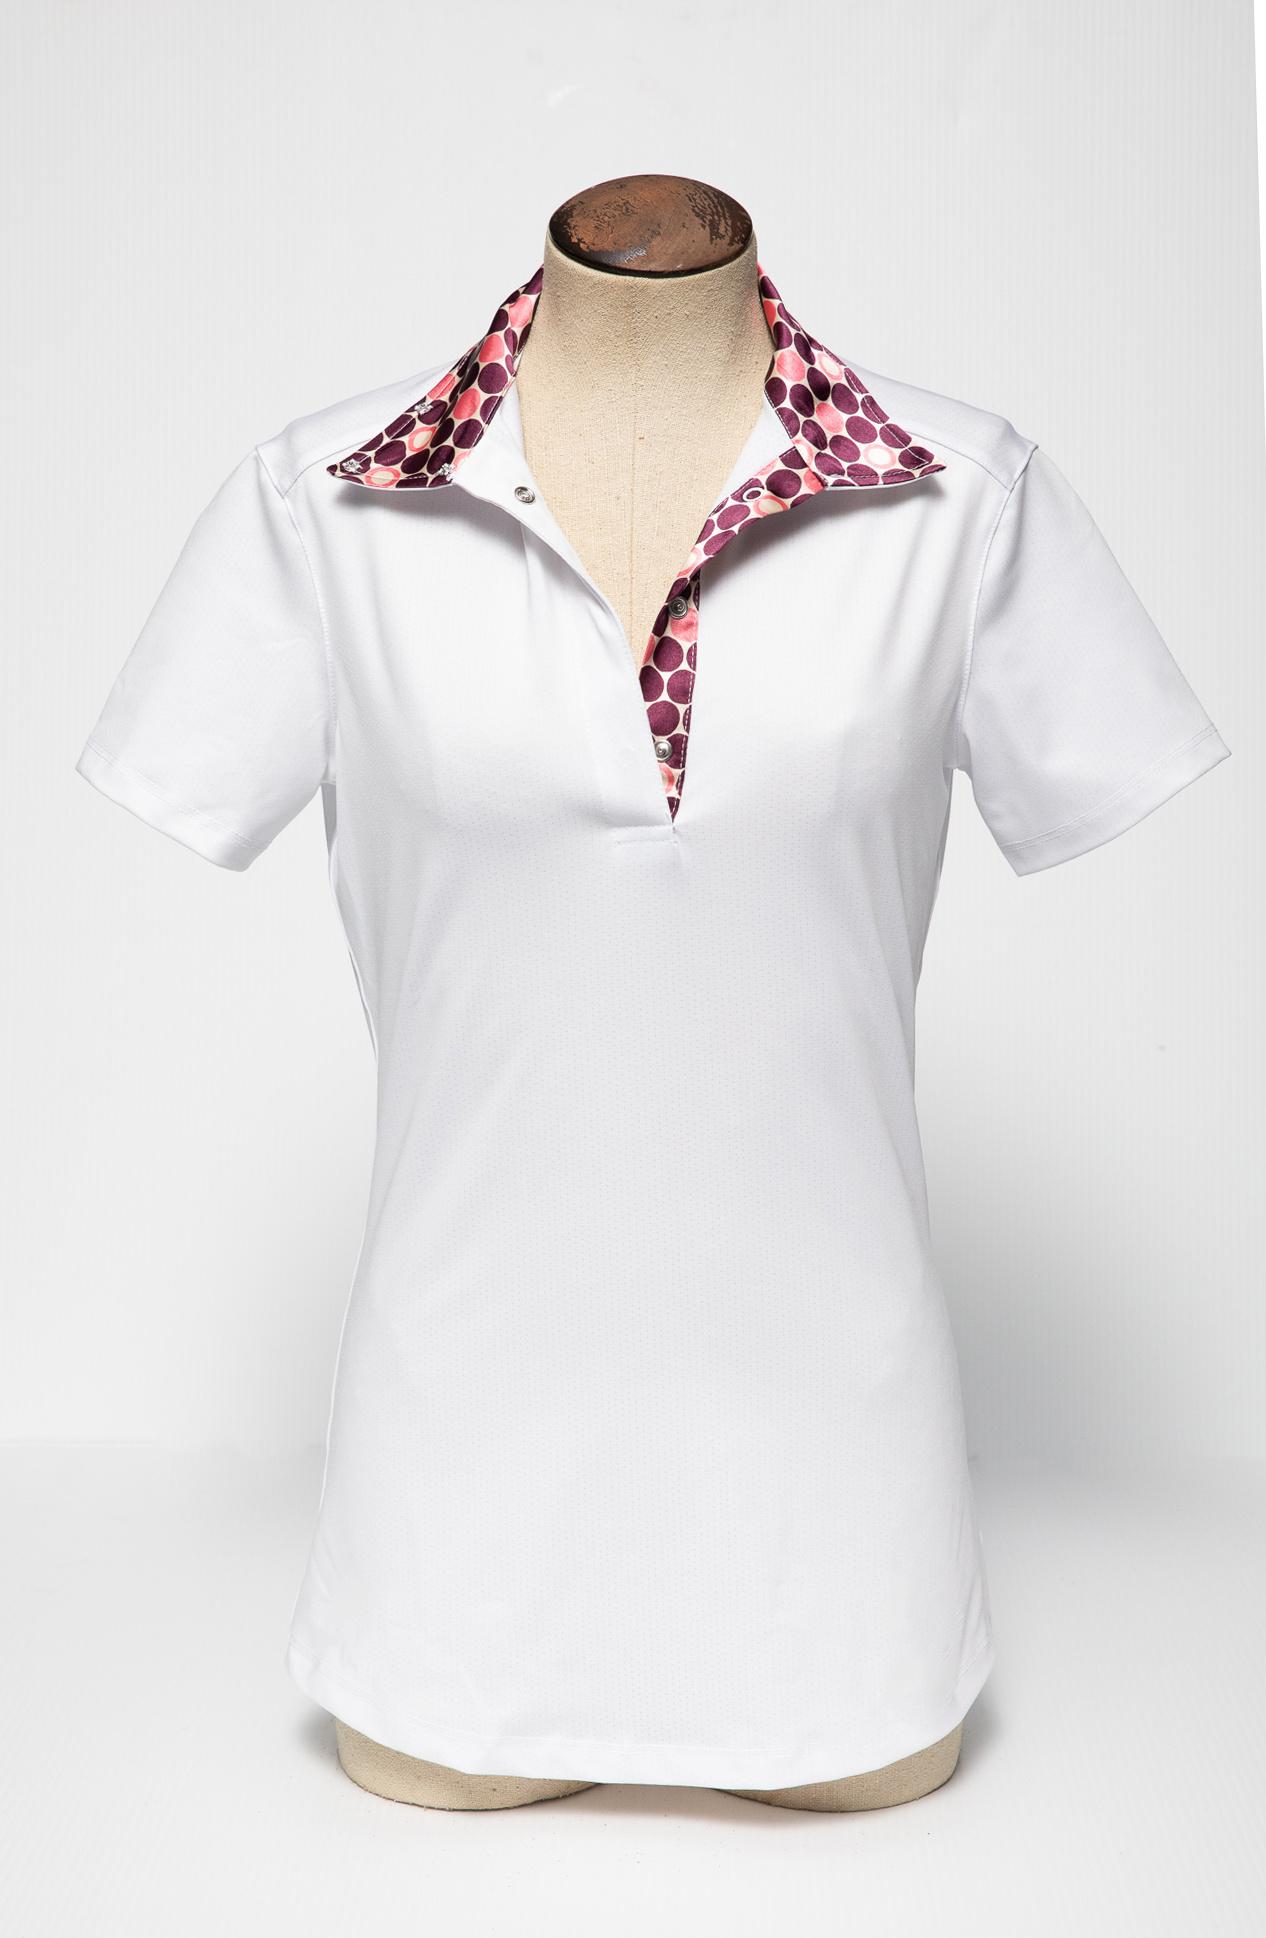 Tailored Sportsman Short Sleeve Show Shirt